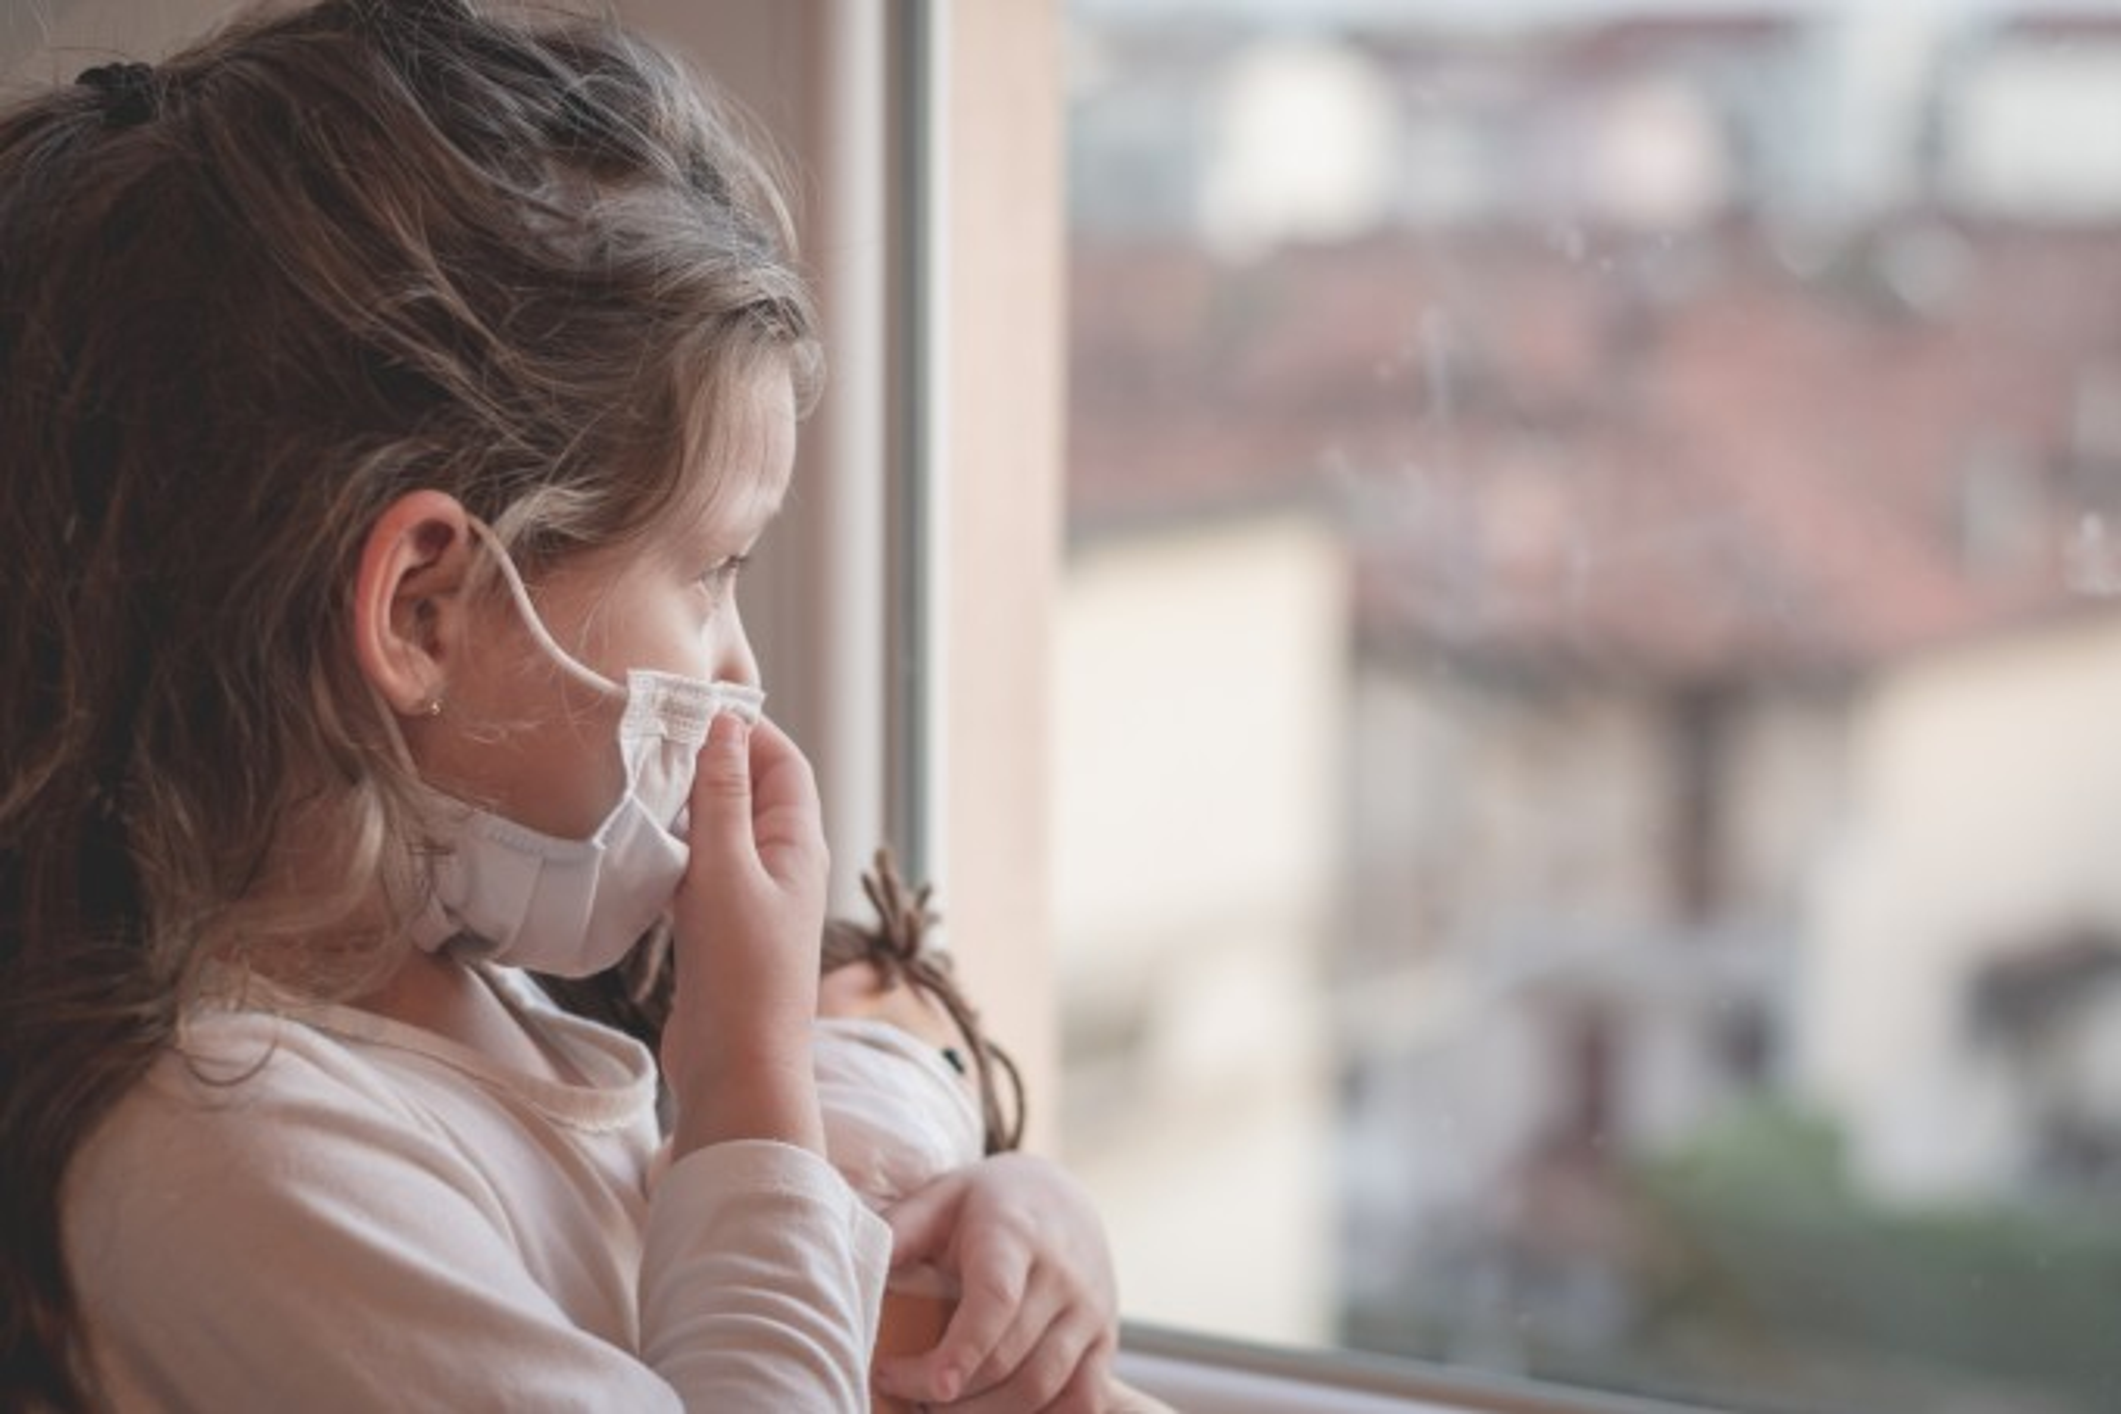 menina-mascara-olhando-para-janela